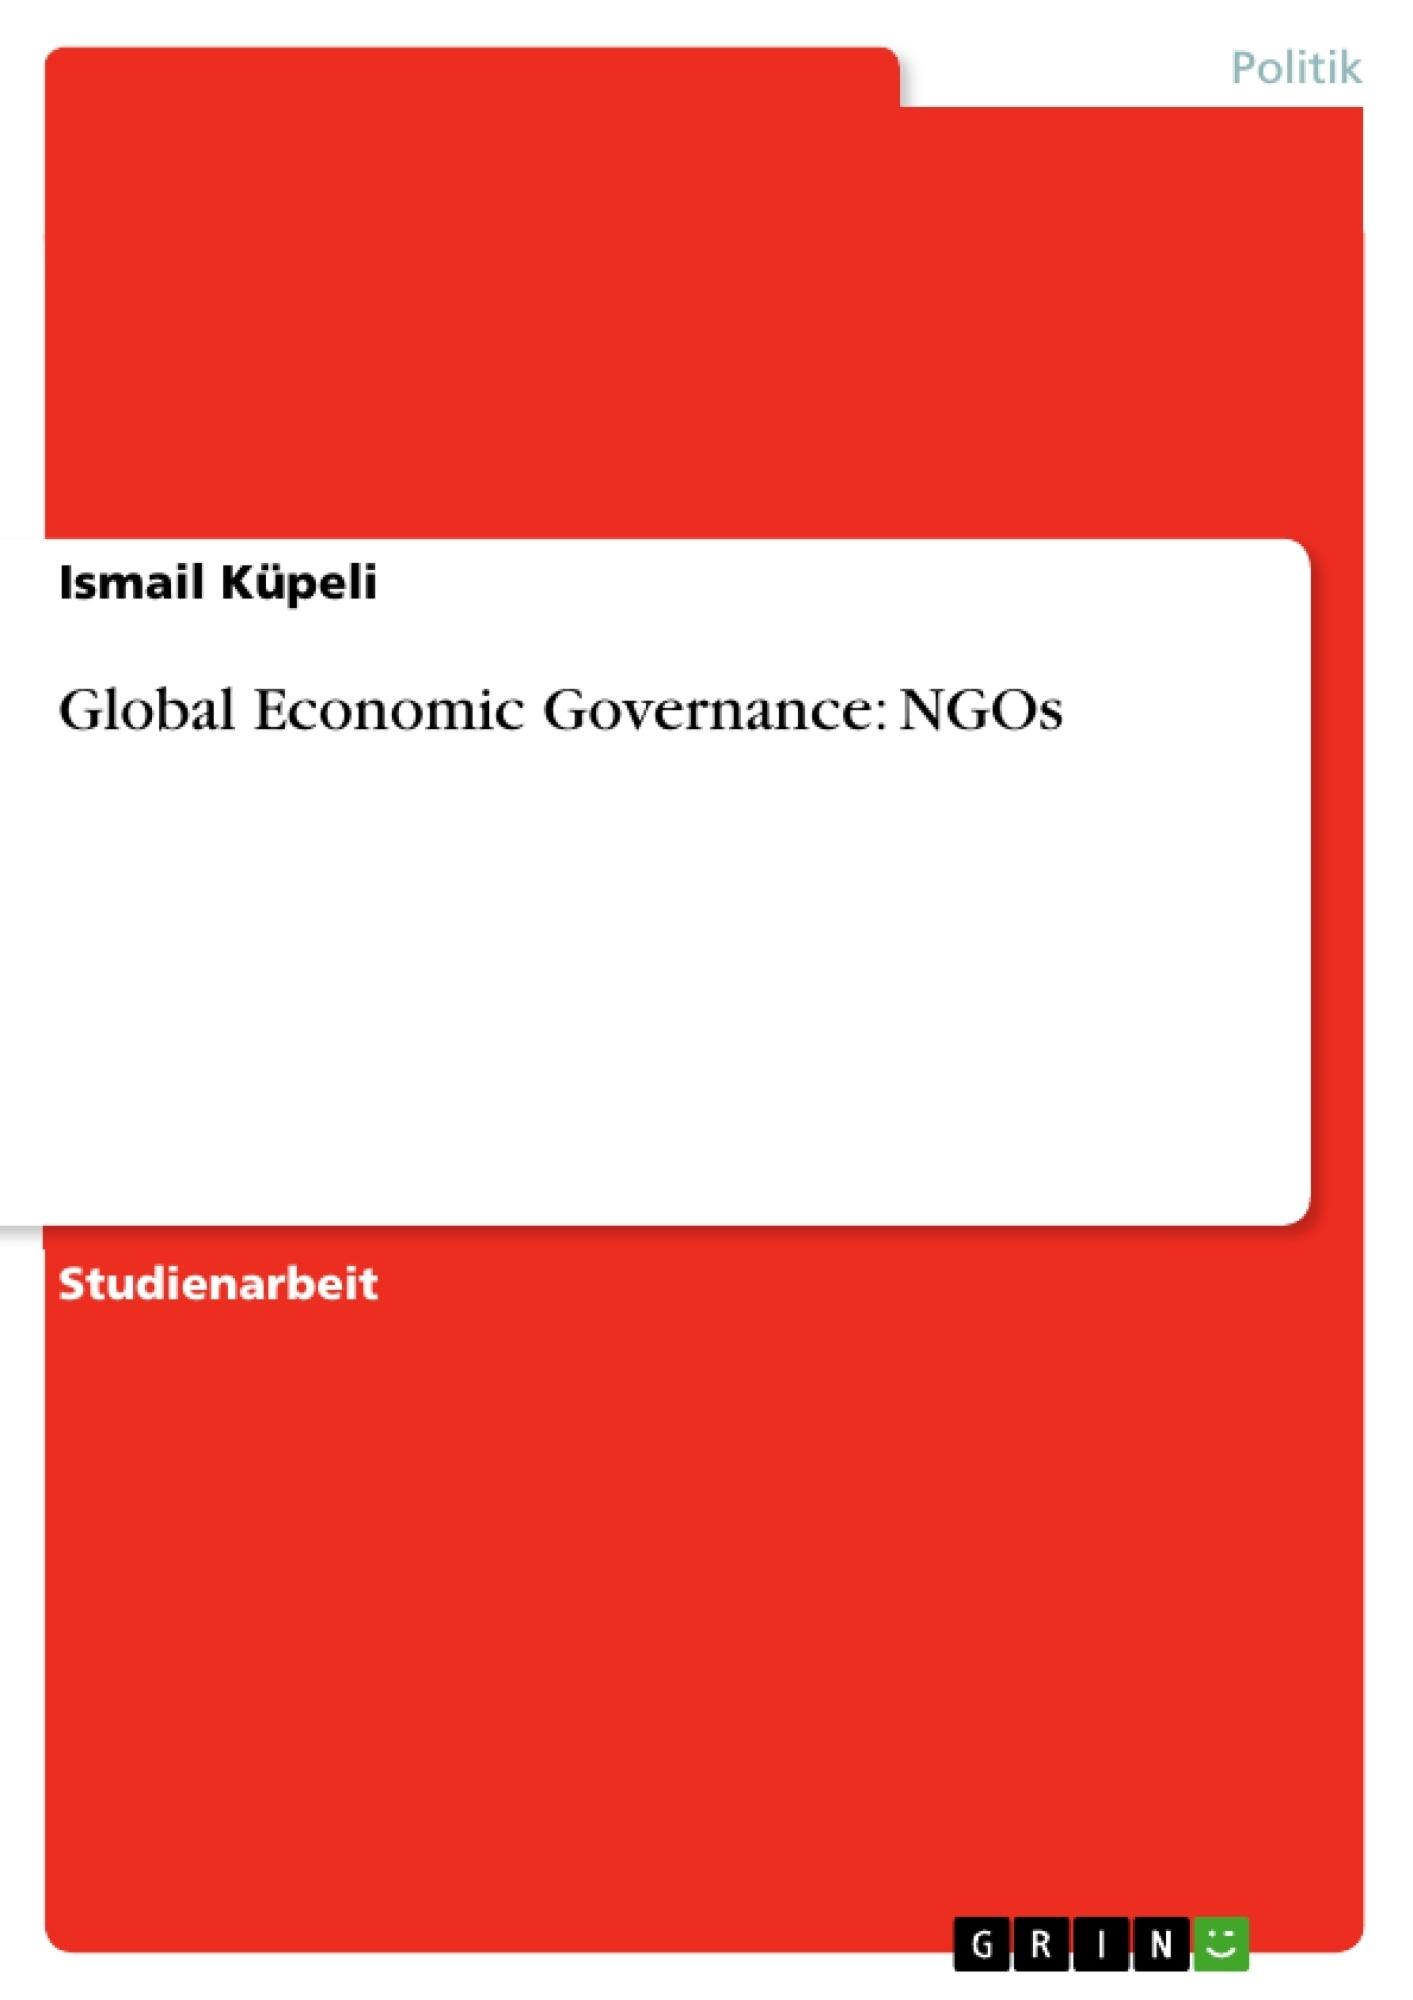 Titel: Global Economic Governance: NGOs